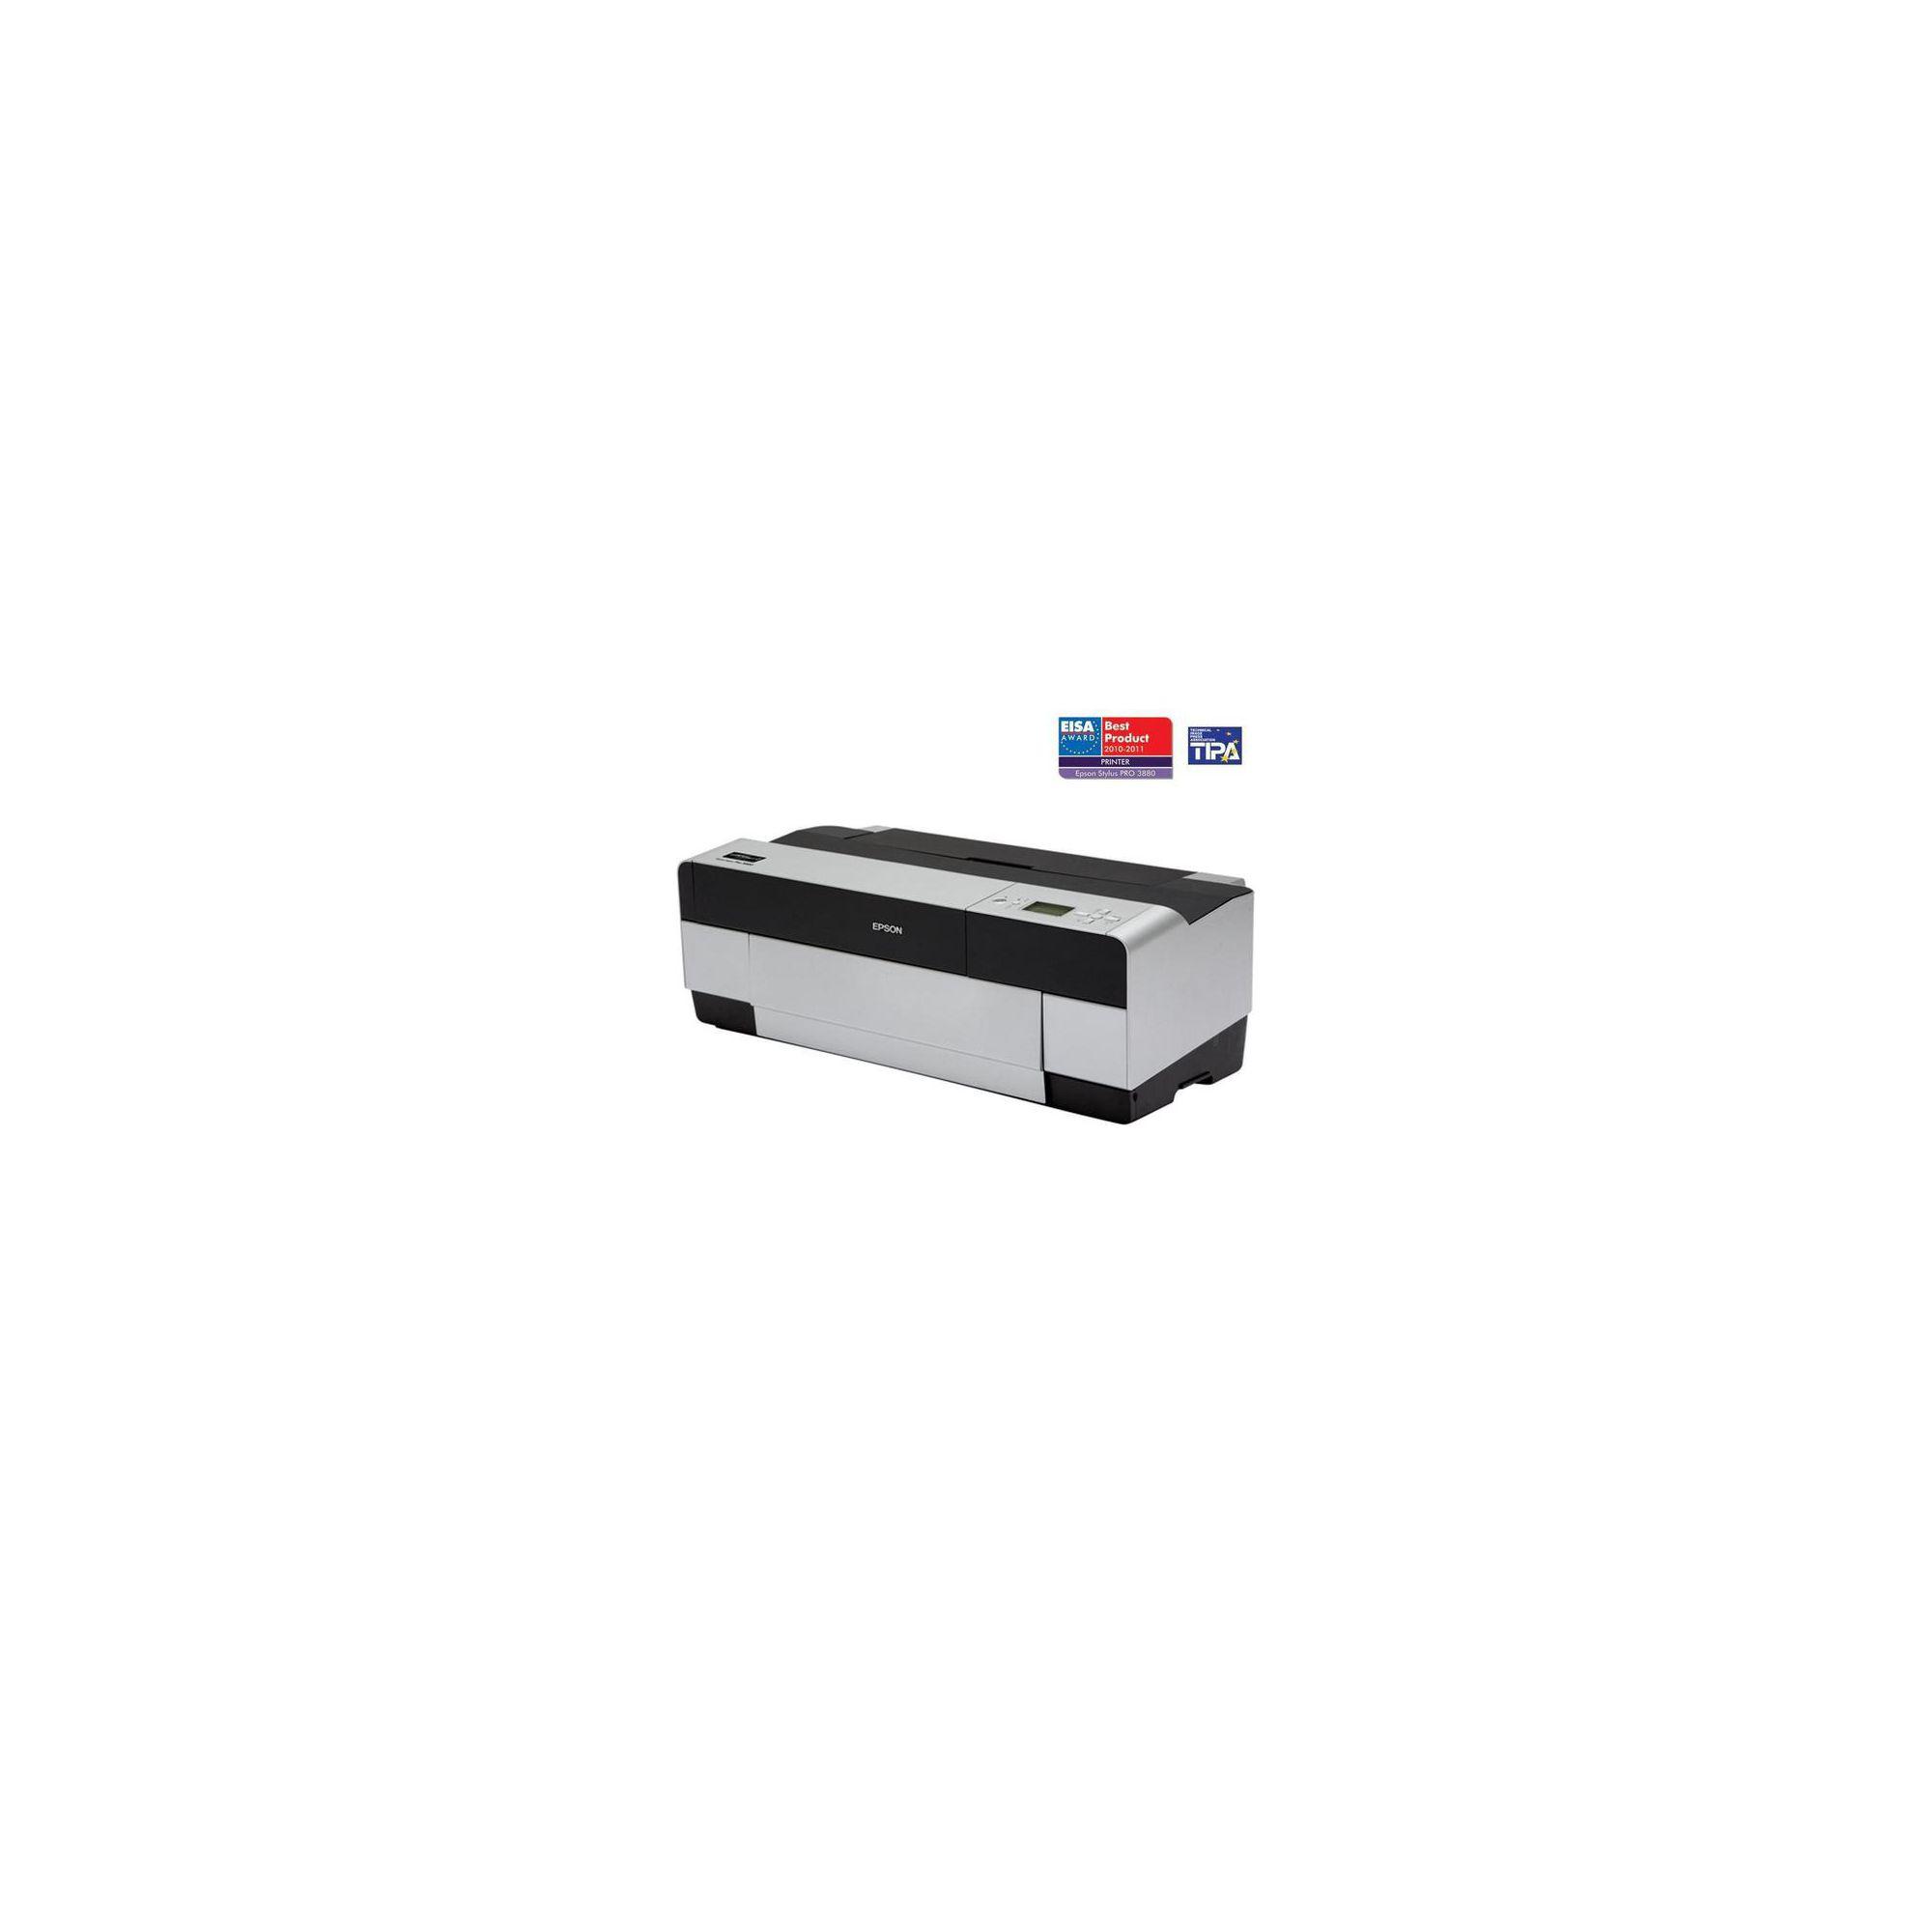 Epson Stylus Pro 3880 Colour Desktop Wide Format Inkjet Printer at Tesco Direct